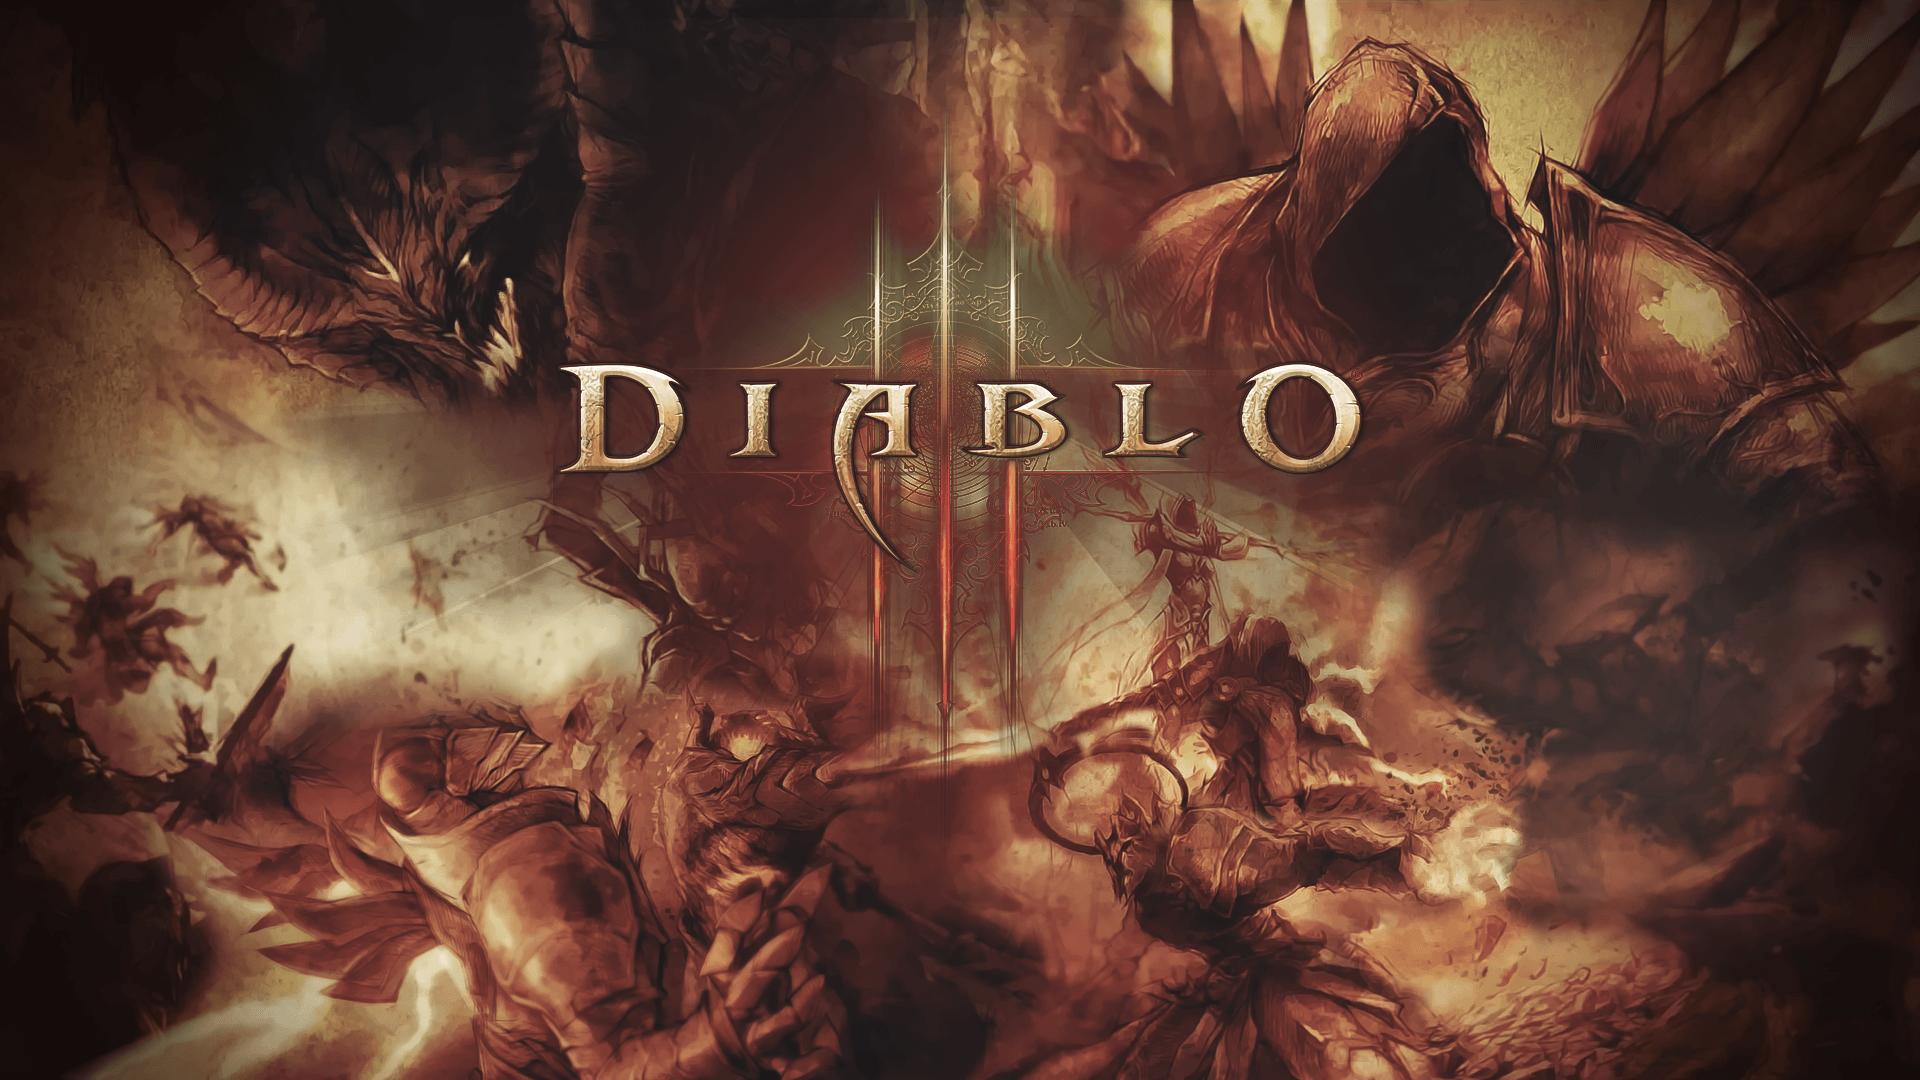 Diablo 3 Wallpapers HD Group (70+)